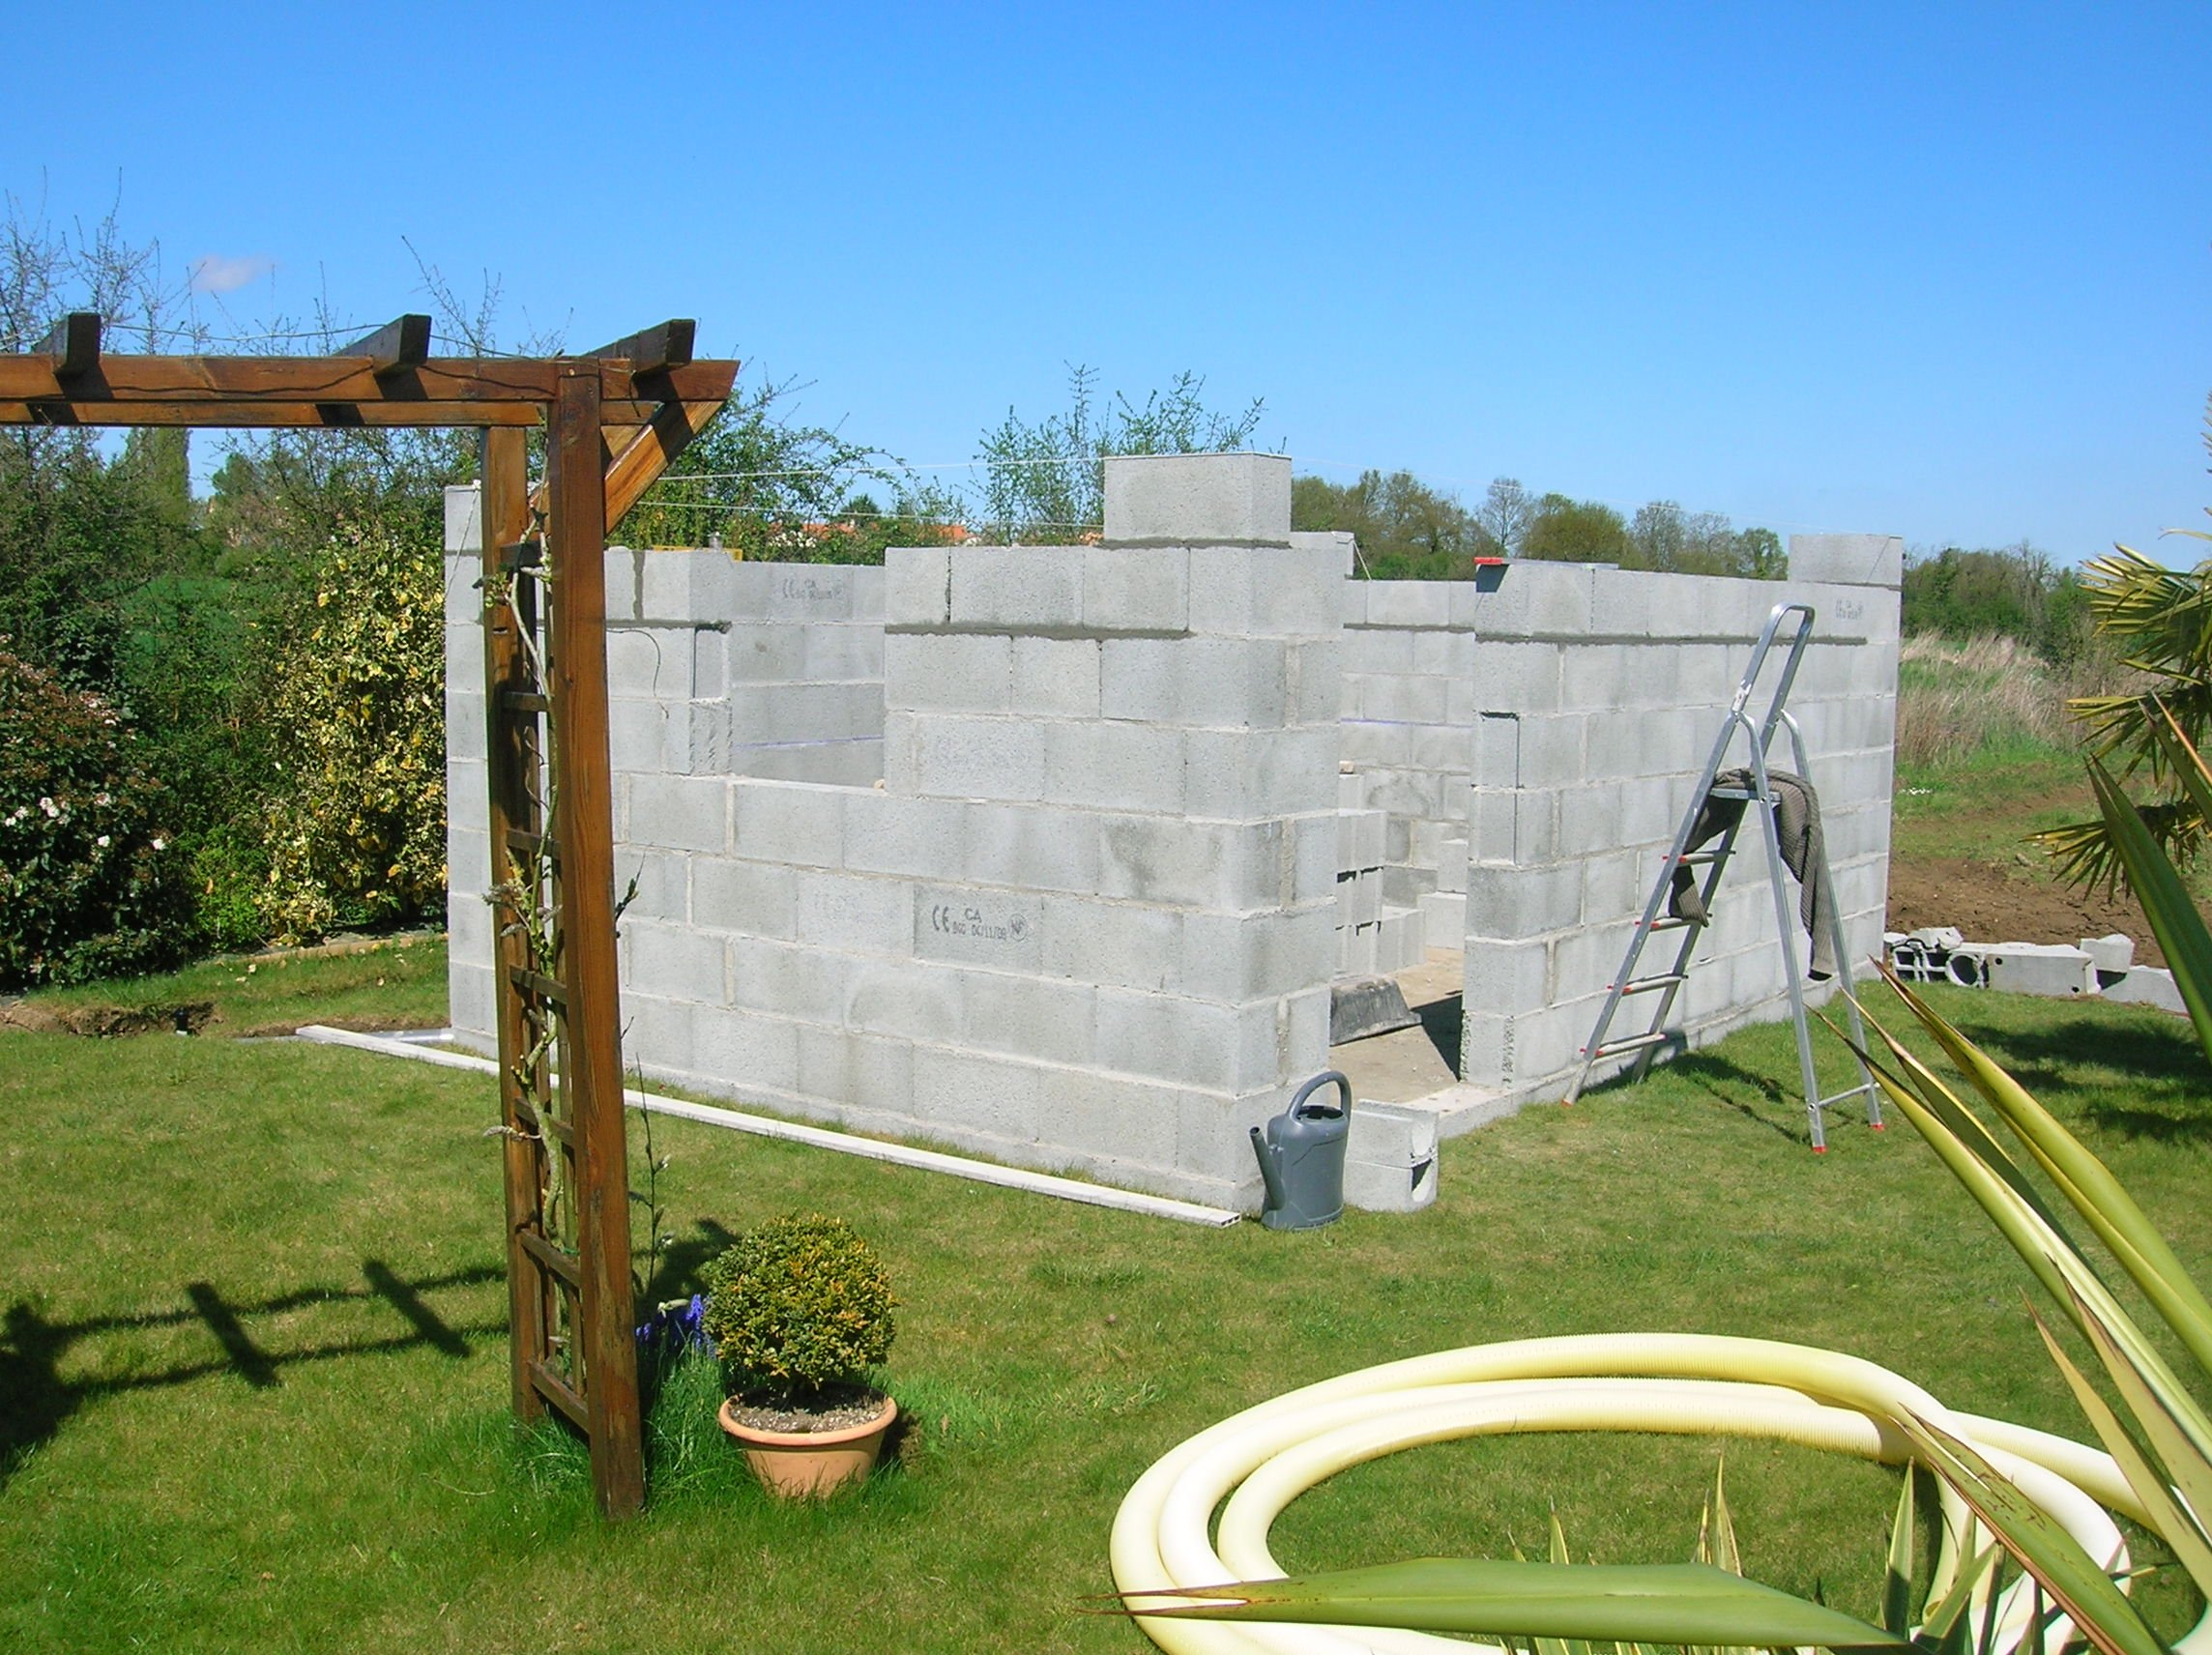 Construction de mon abri de jardin dernier rang de - Construire abri de jardin en parpaing ...